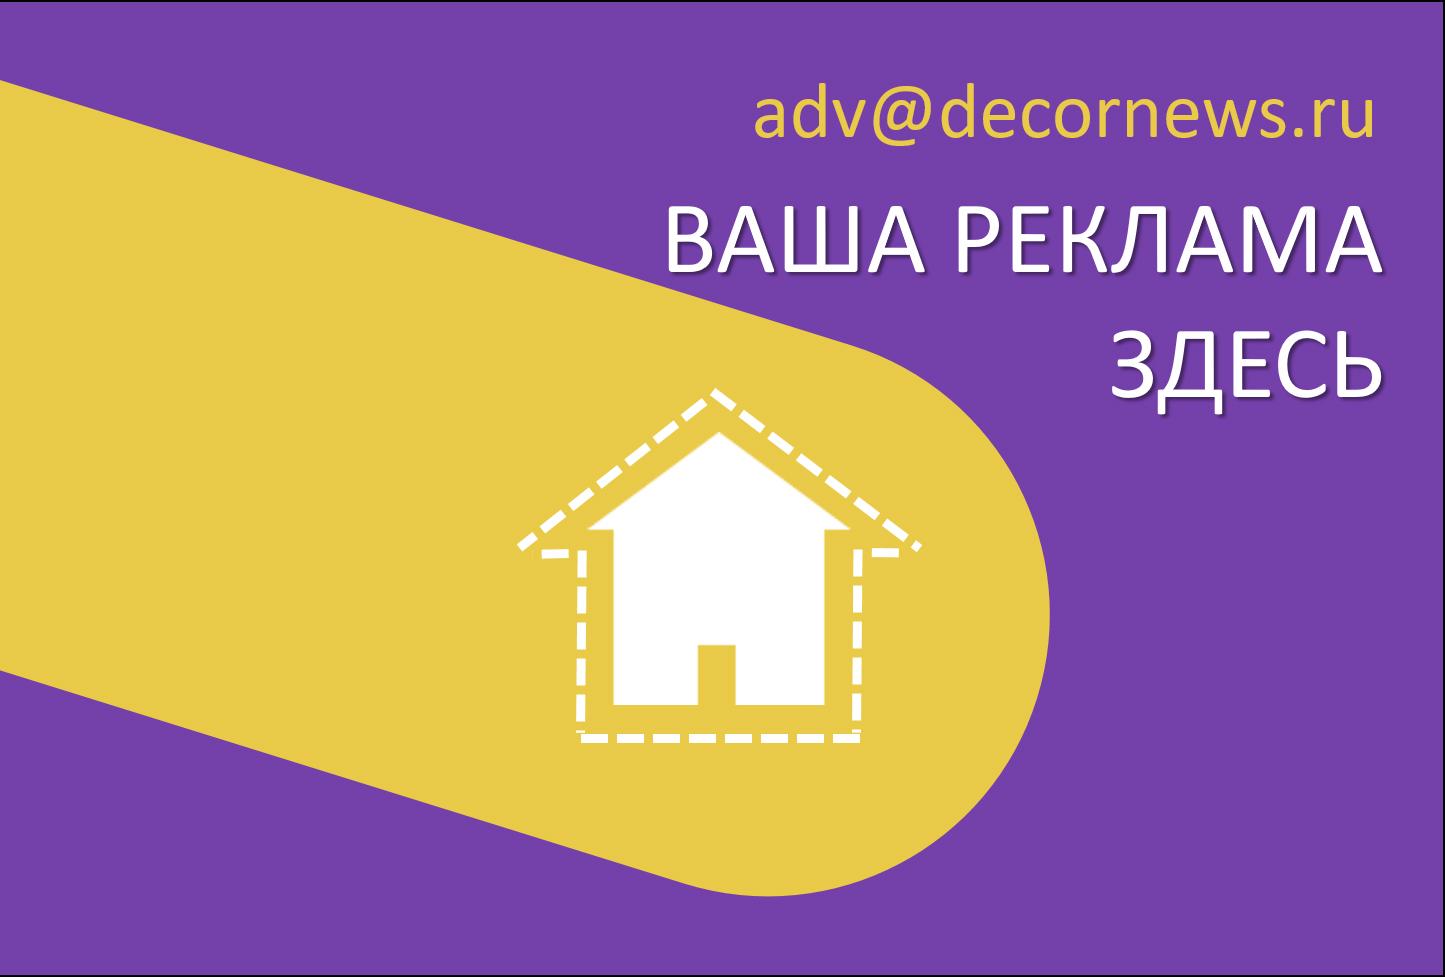 Реклама на портале о дизайне и архитектуре Decornews.ru